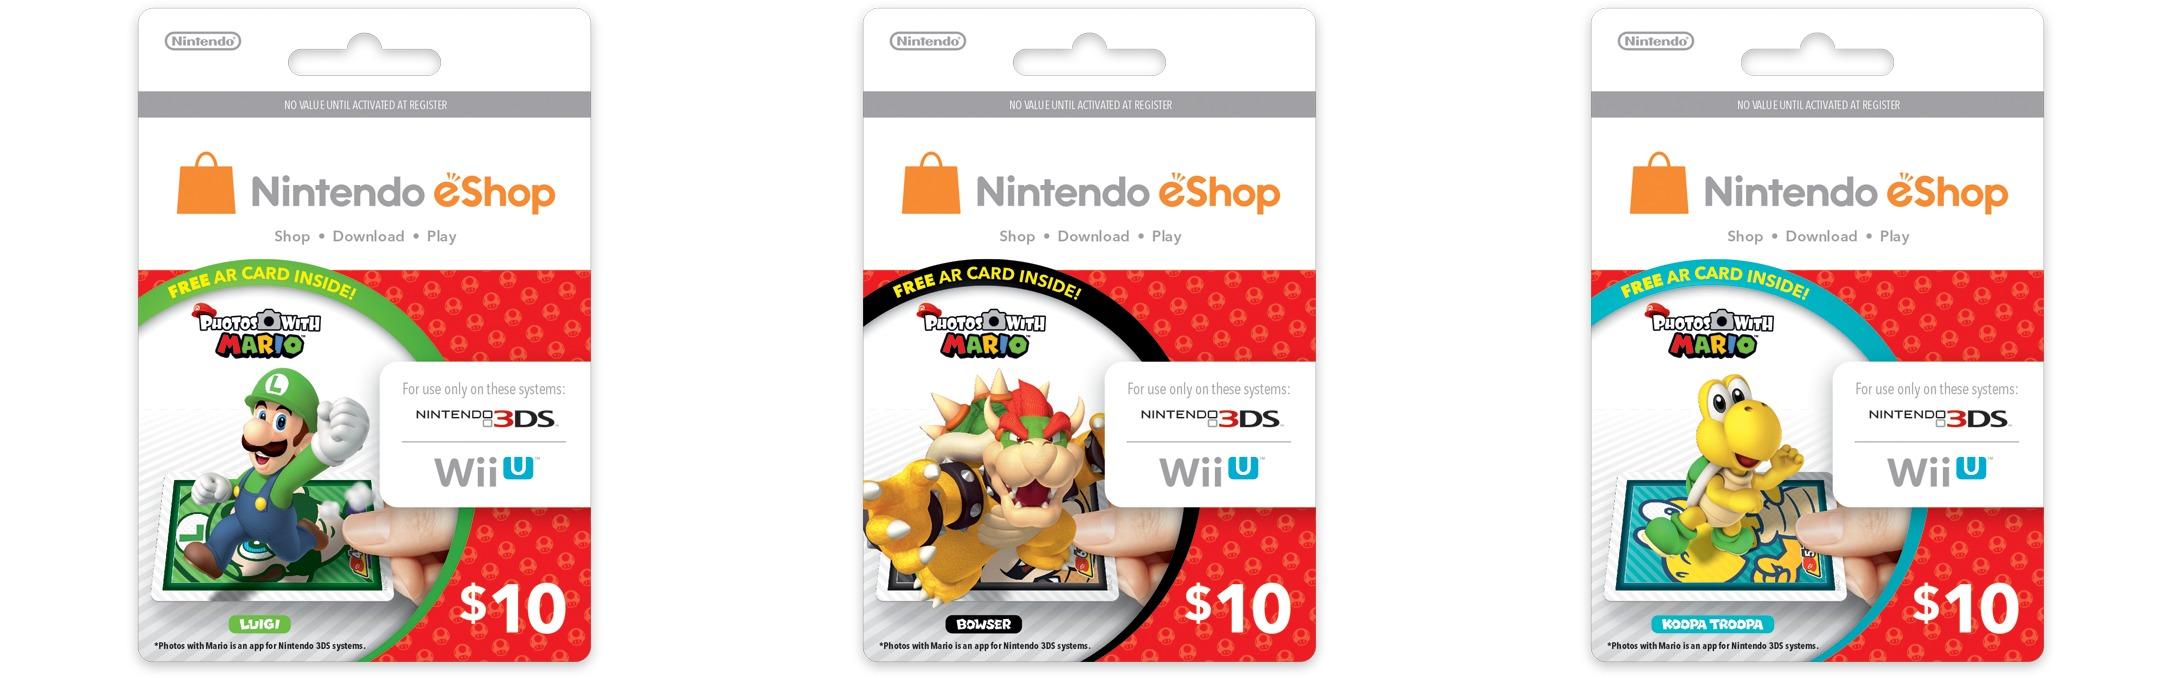 Nintendo Eshop Karte.Nordamerika Nintendo Eshop Cards Mit Ar Karten Zu Figuren Aus Dem